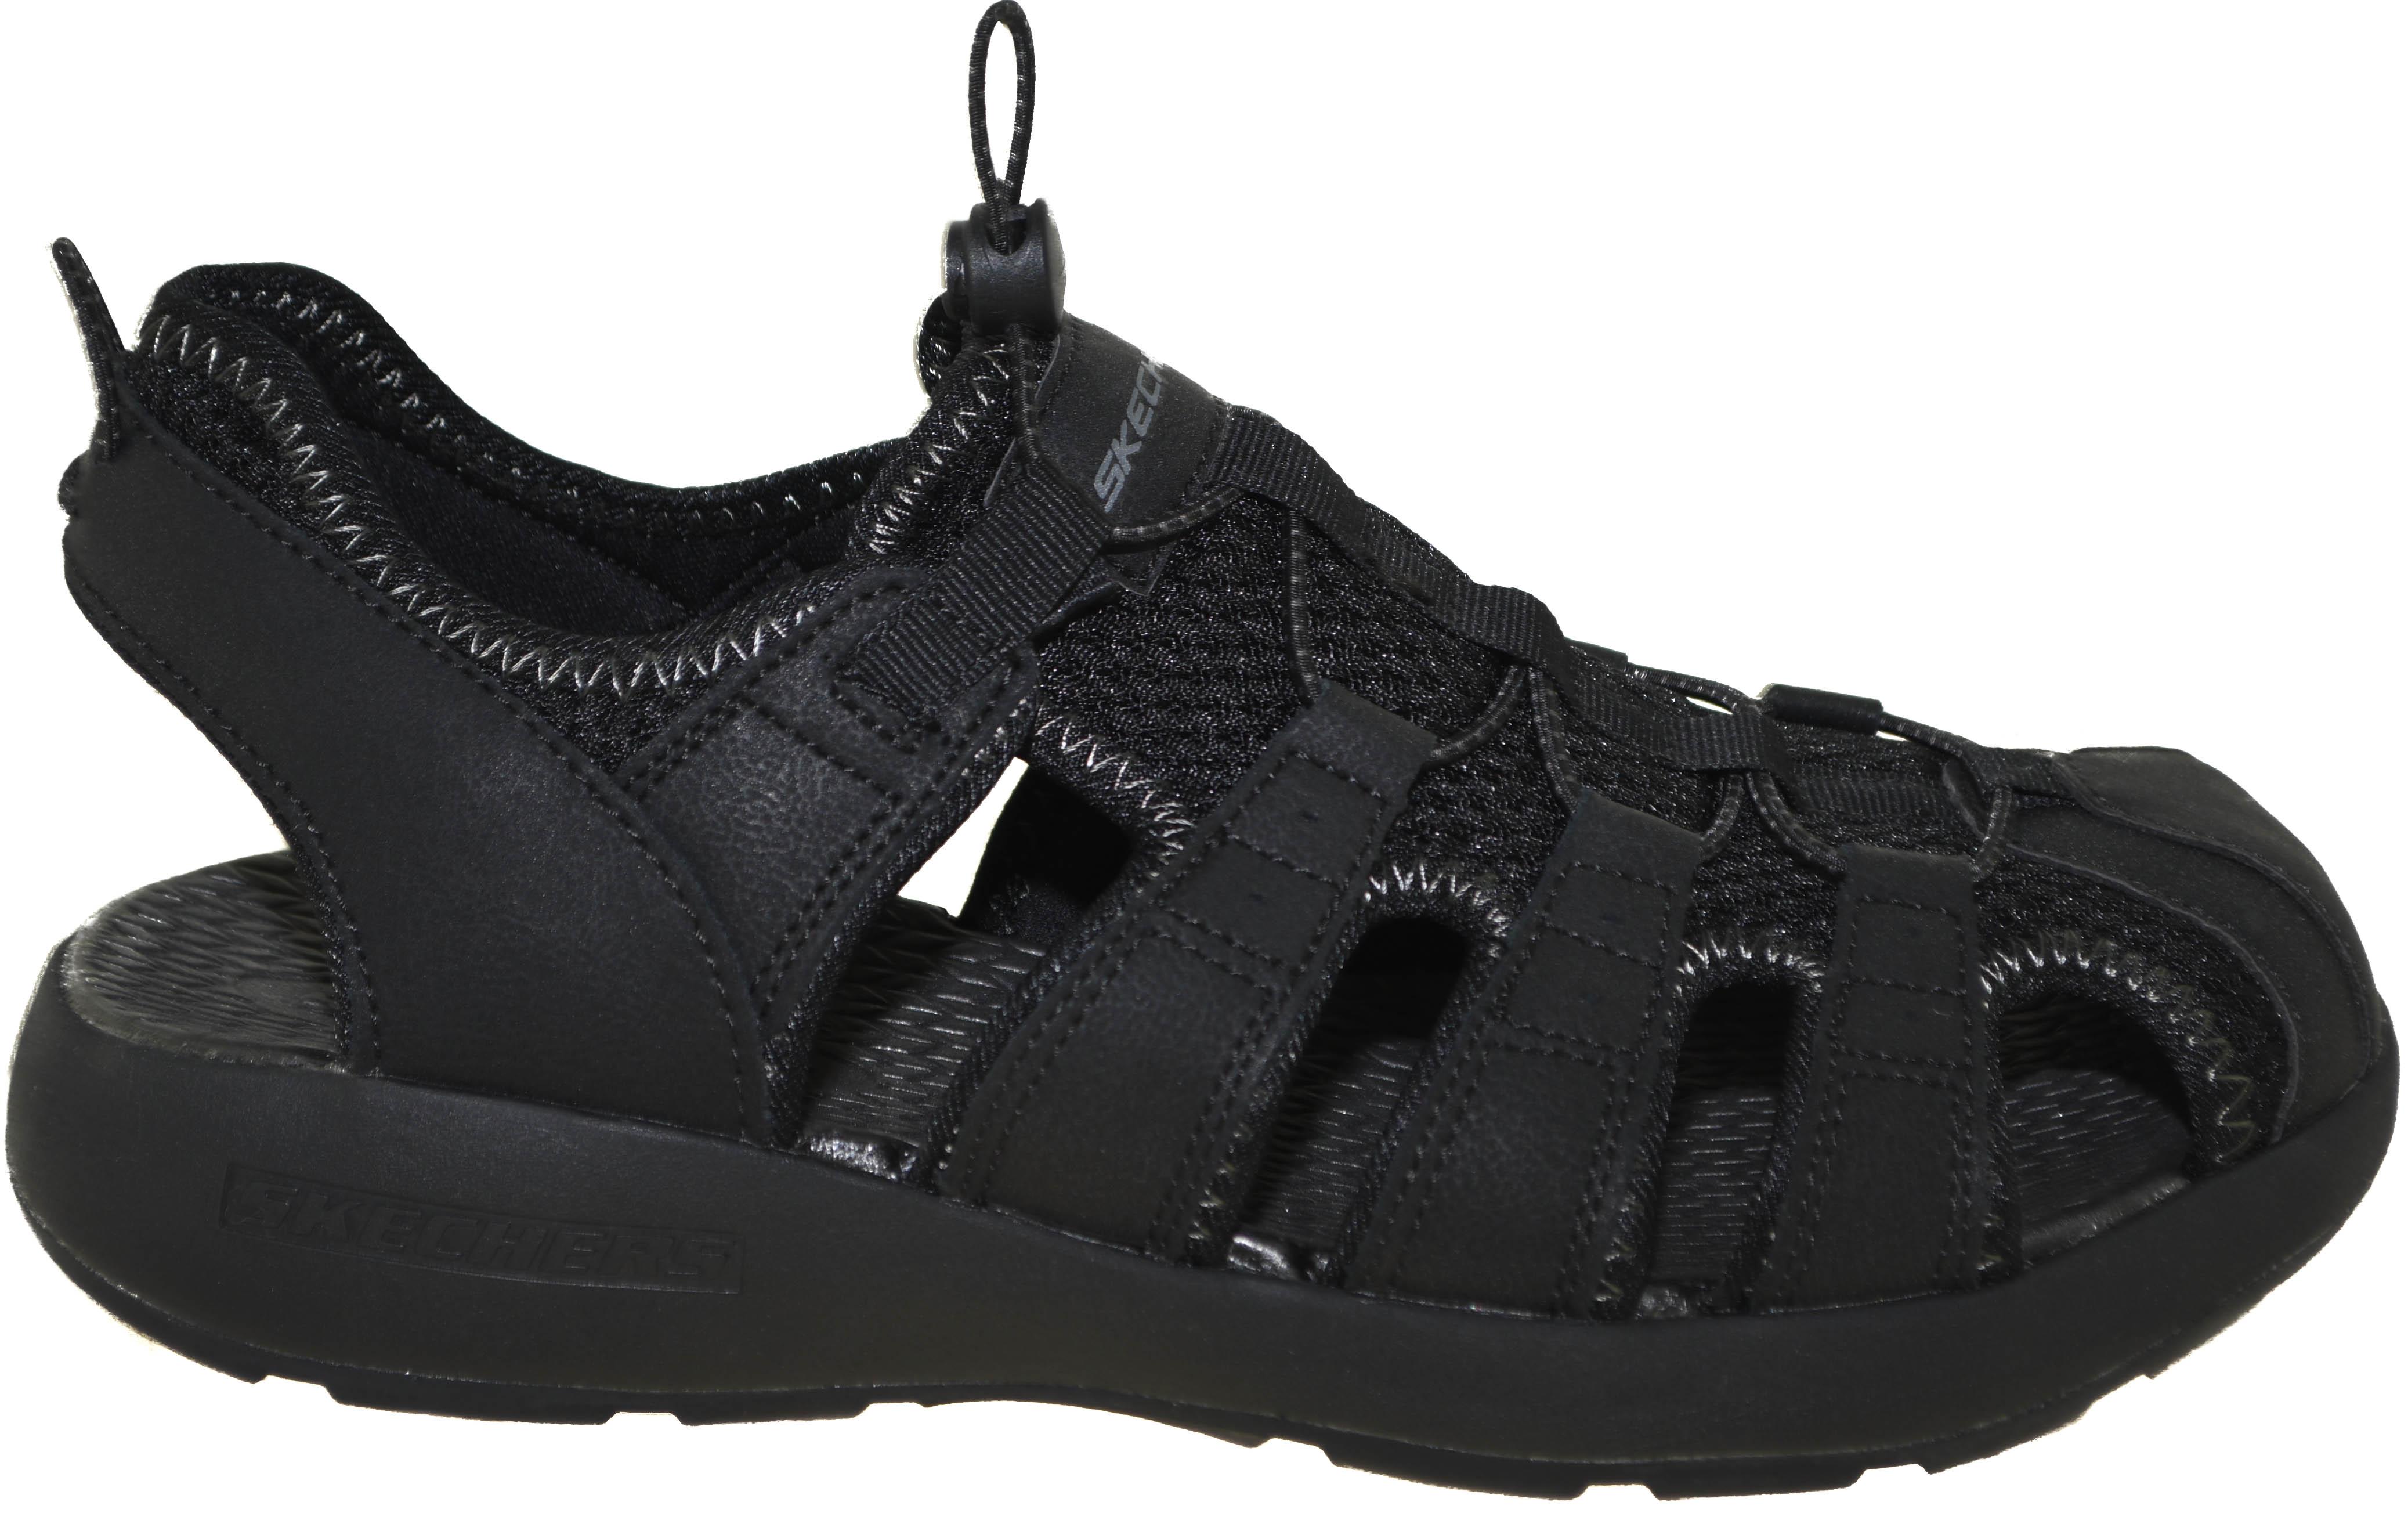 Skechers Journeyman Men 10 black fisherman sandals